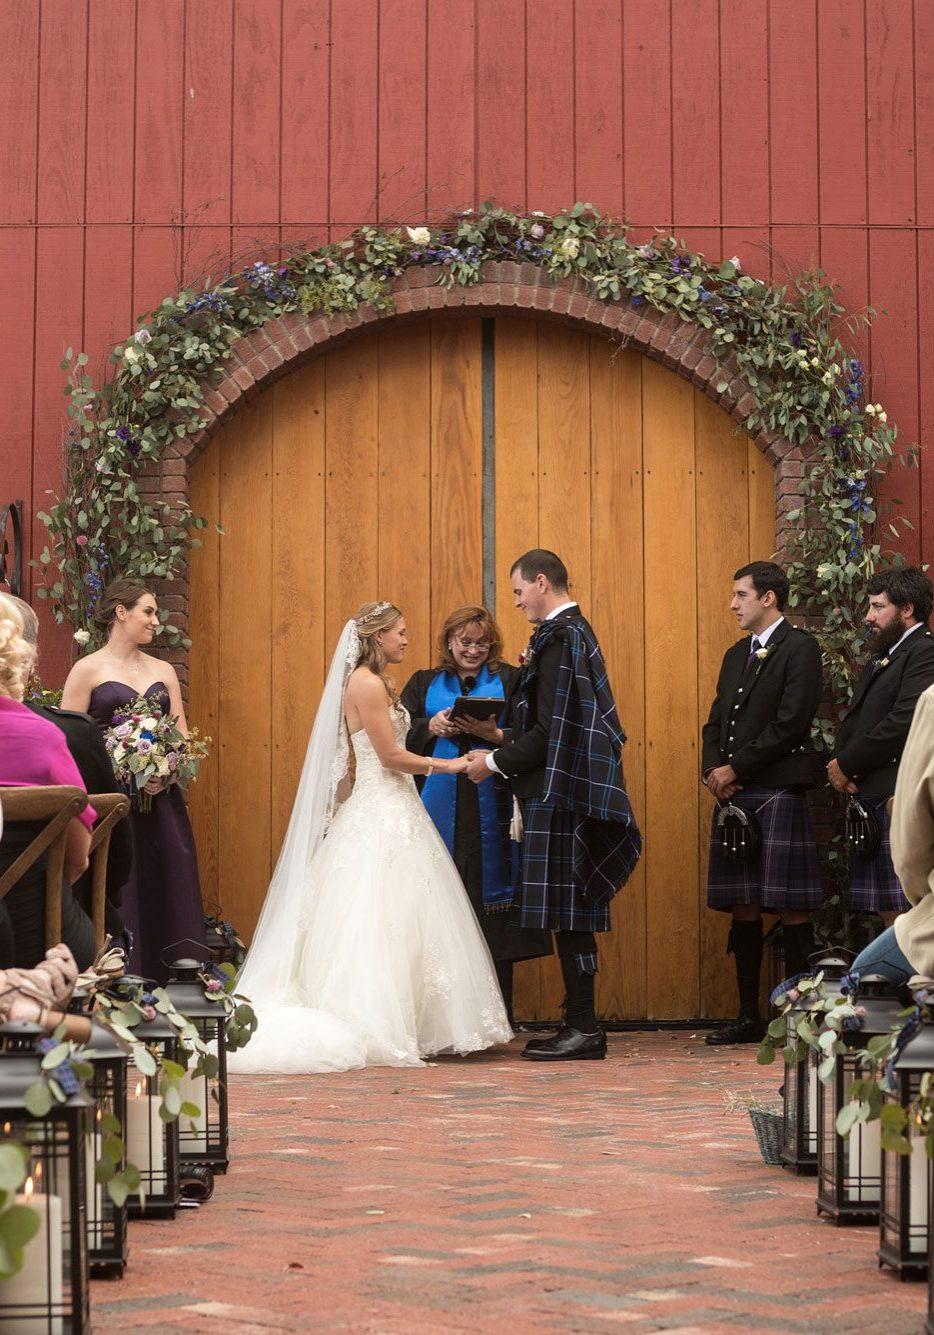 A Scottish Inspired Wedding in Colorado